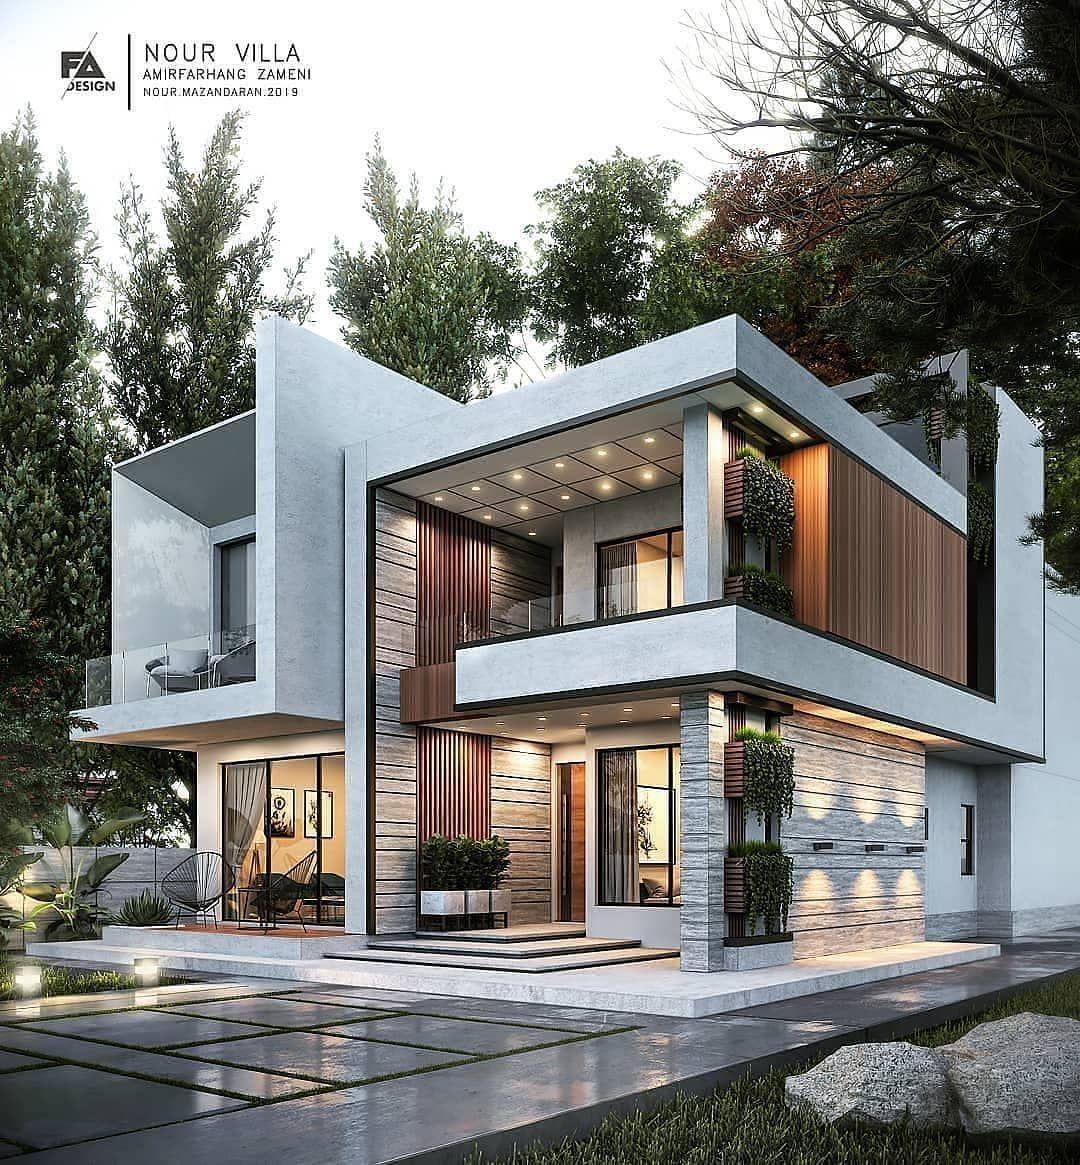 Architecture Visual On Instagram Nour Villa Visualization By Farhang Architect Archvisua Duplex House Design Modern Villa Design House Front Design